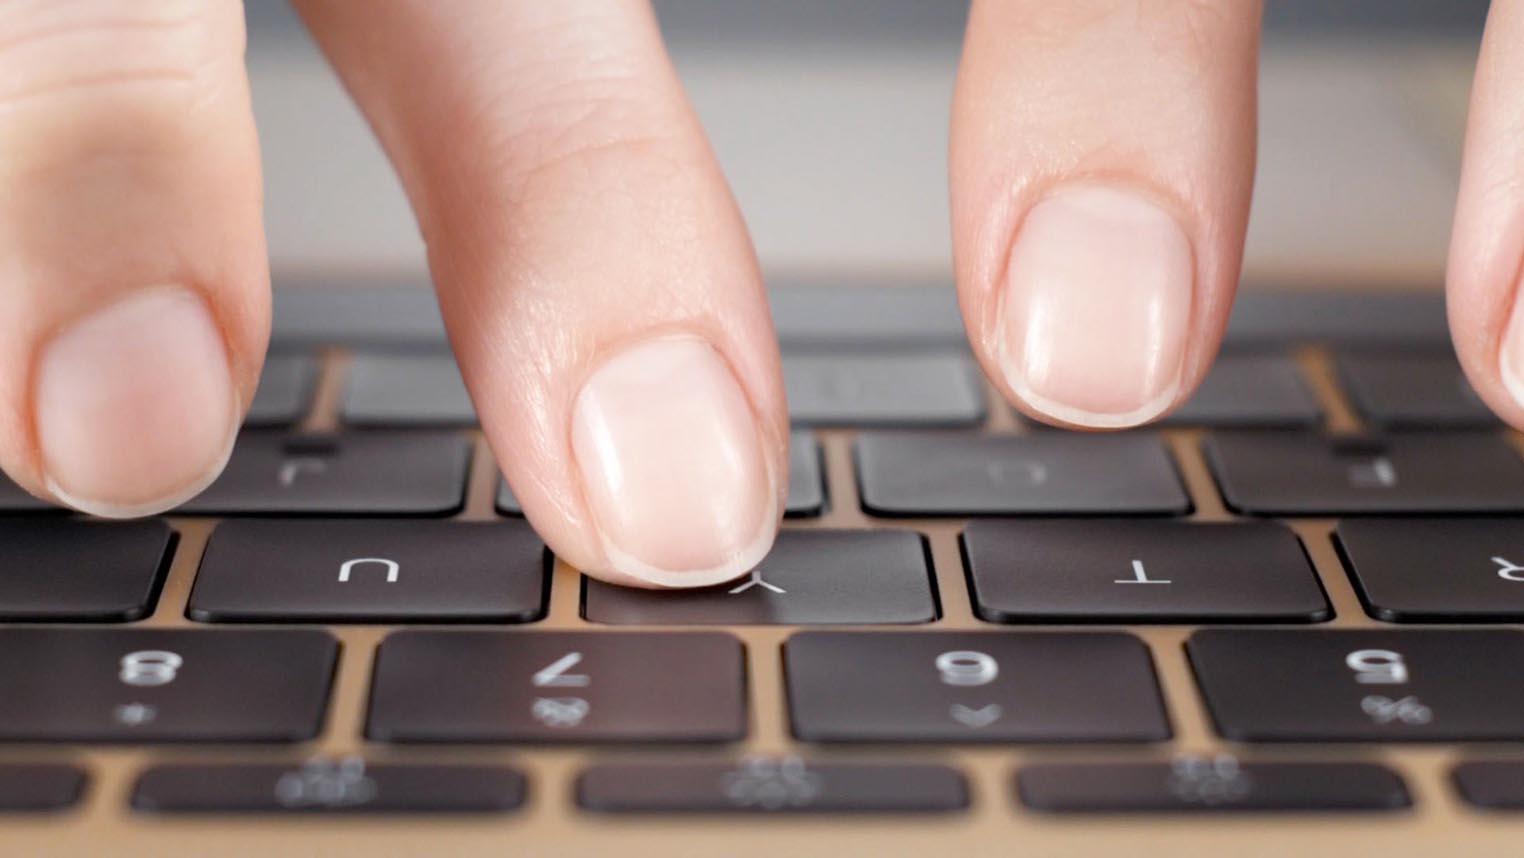 Apple clavier papillon